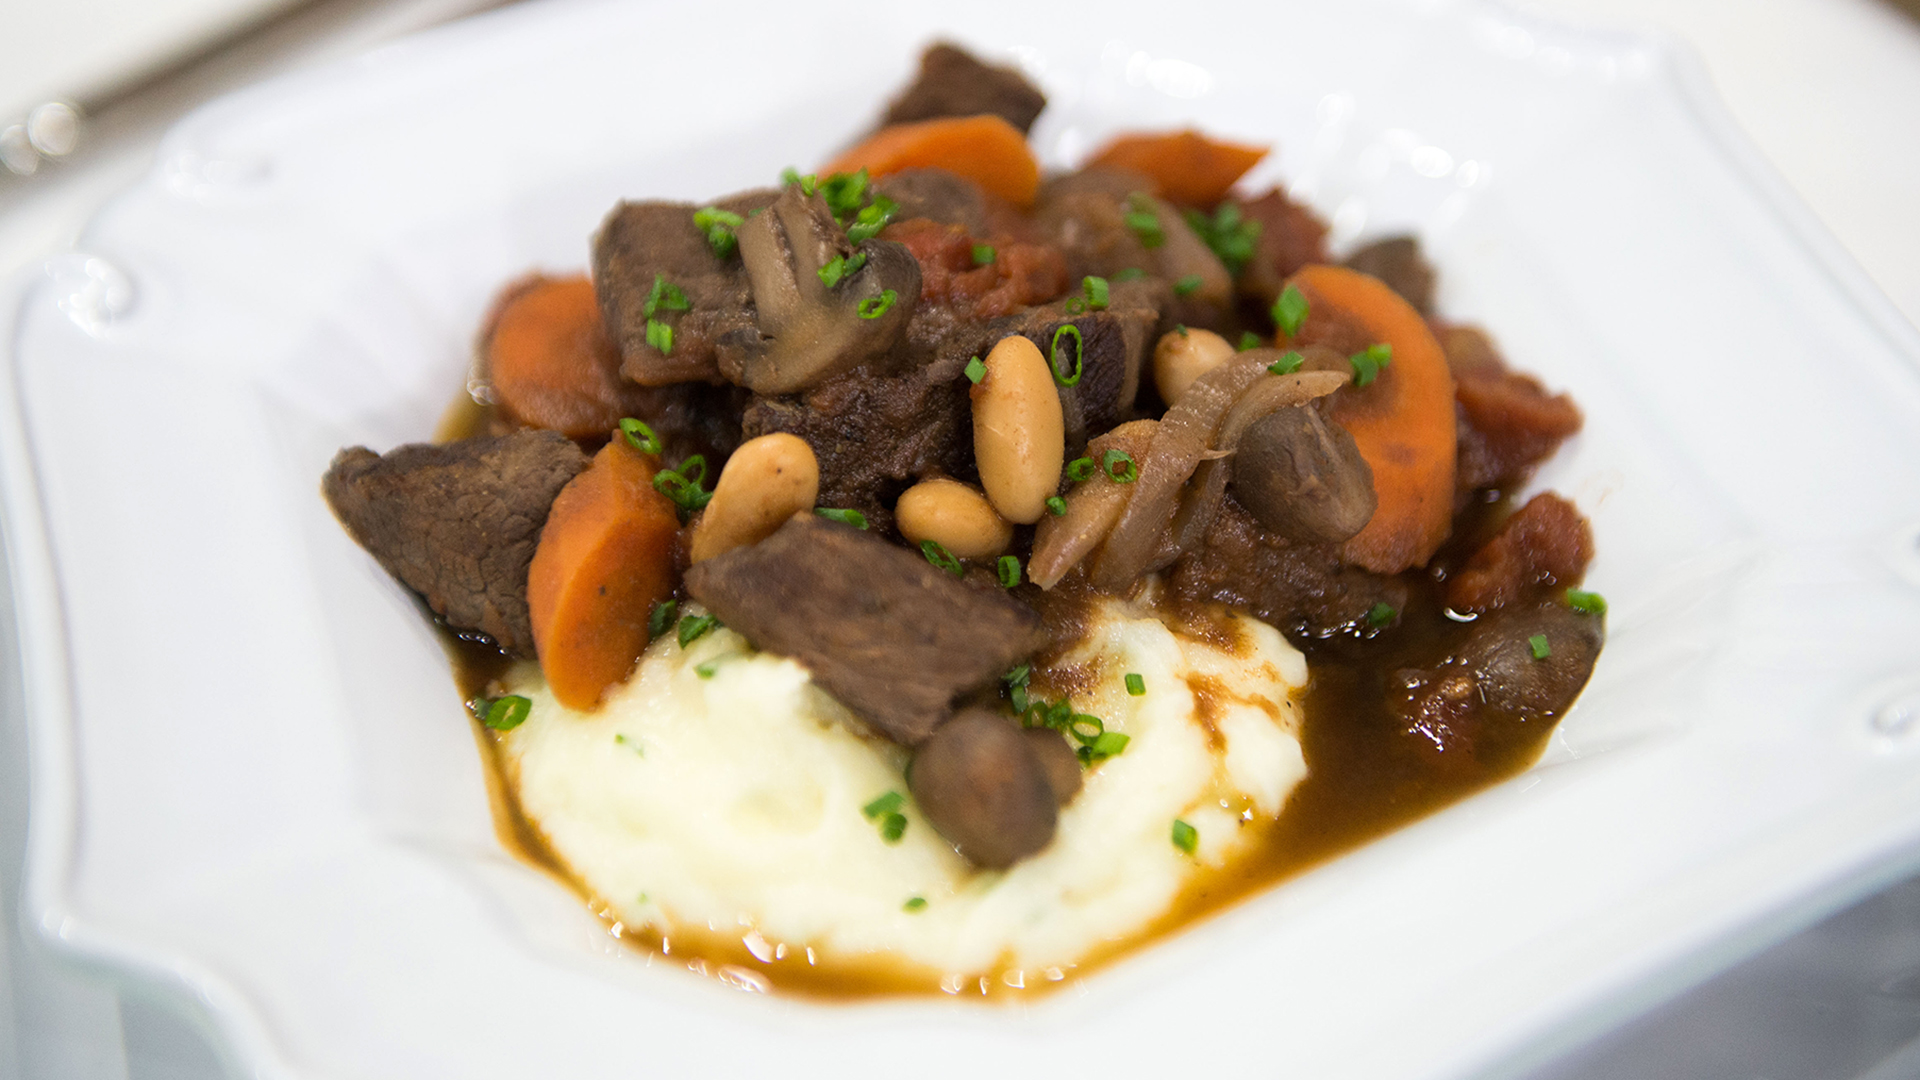 ... Irish dinner: Quick beef stew & velvety mashed potatoes - TODAY.com